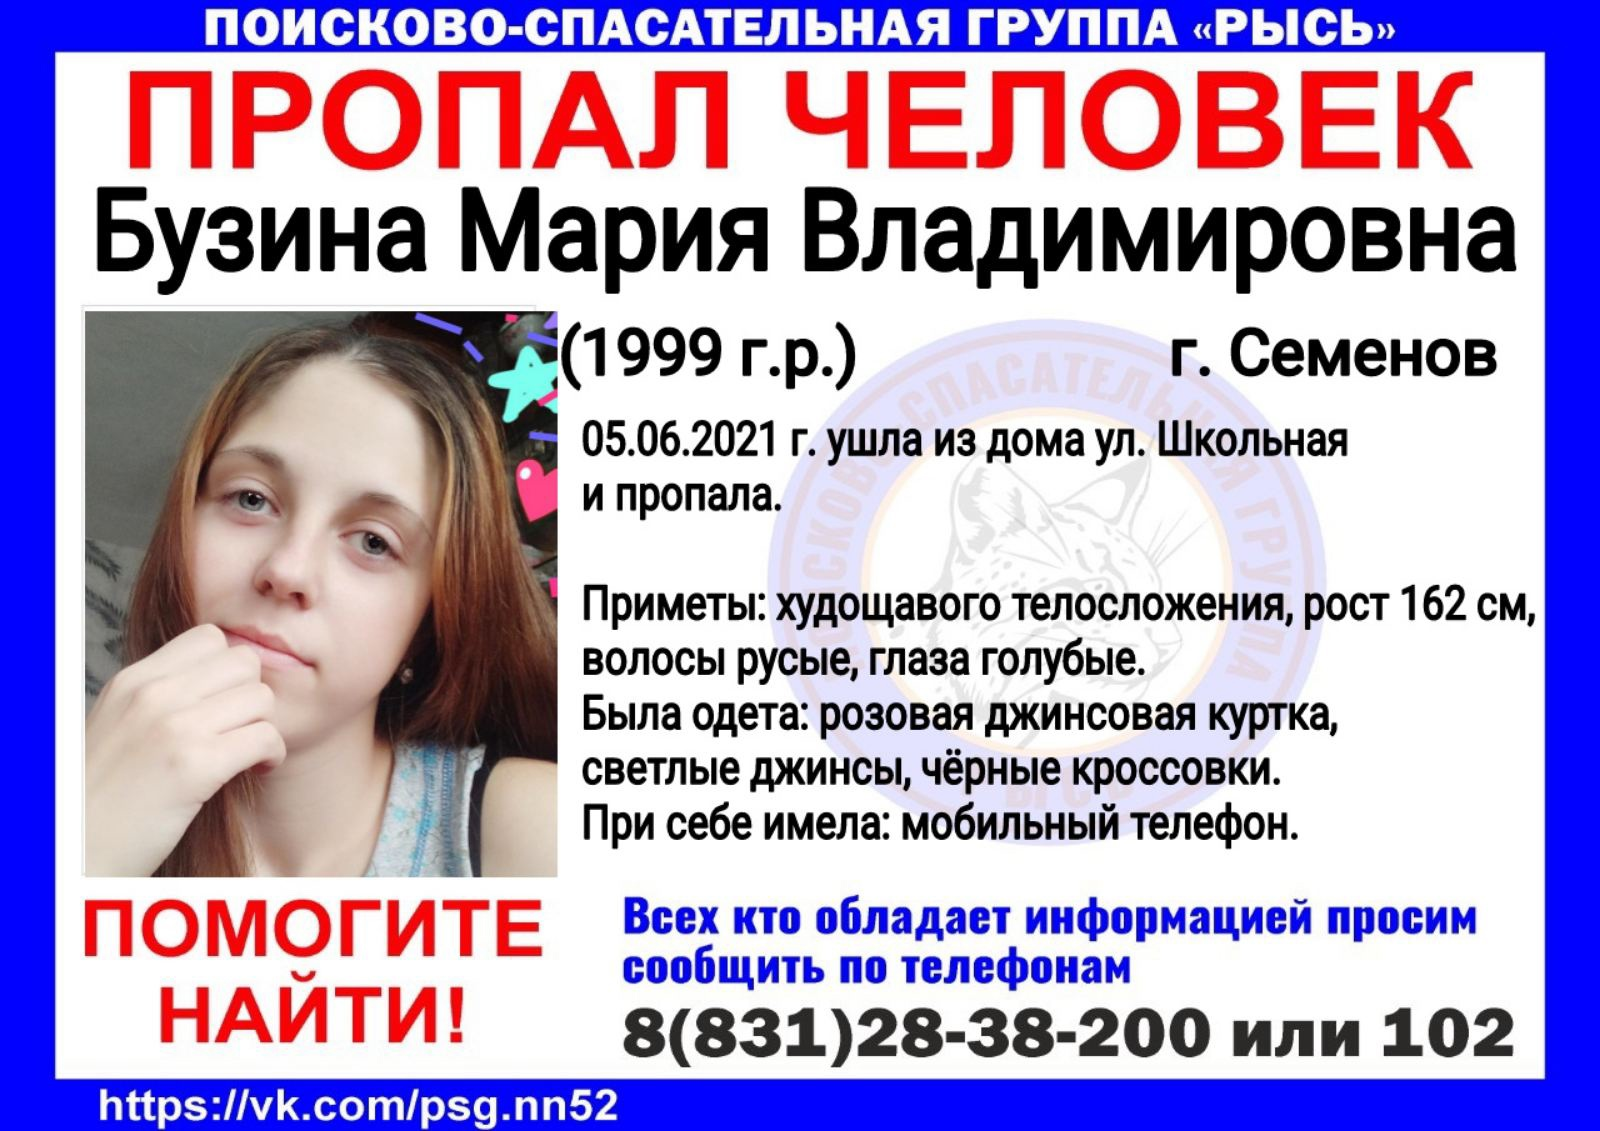 Бузина Мария Владимировна